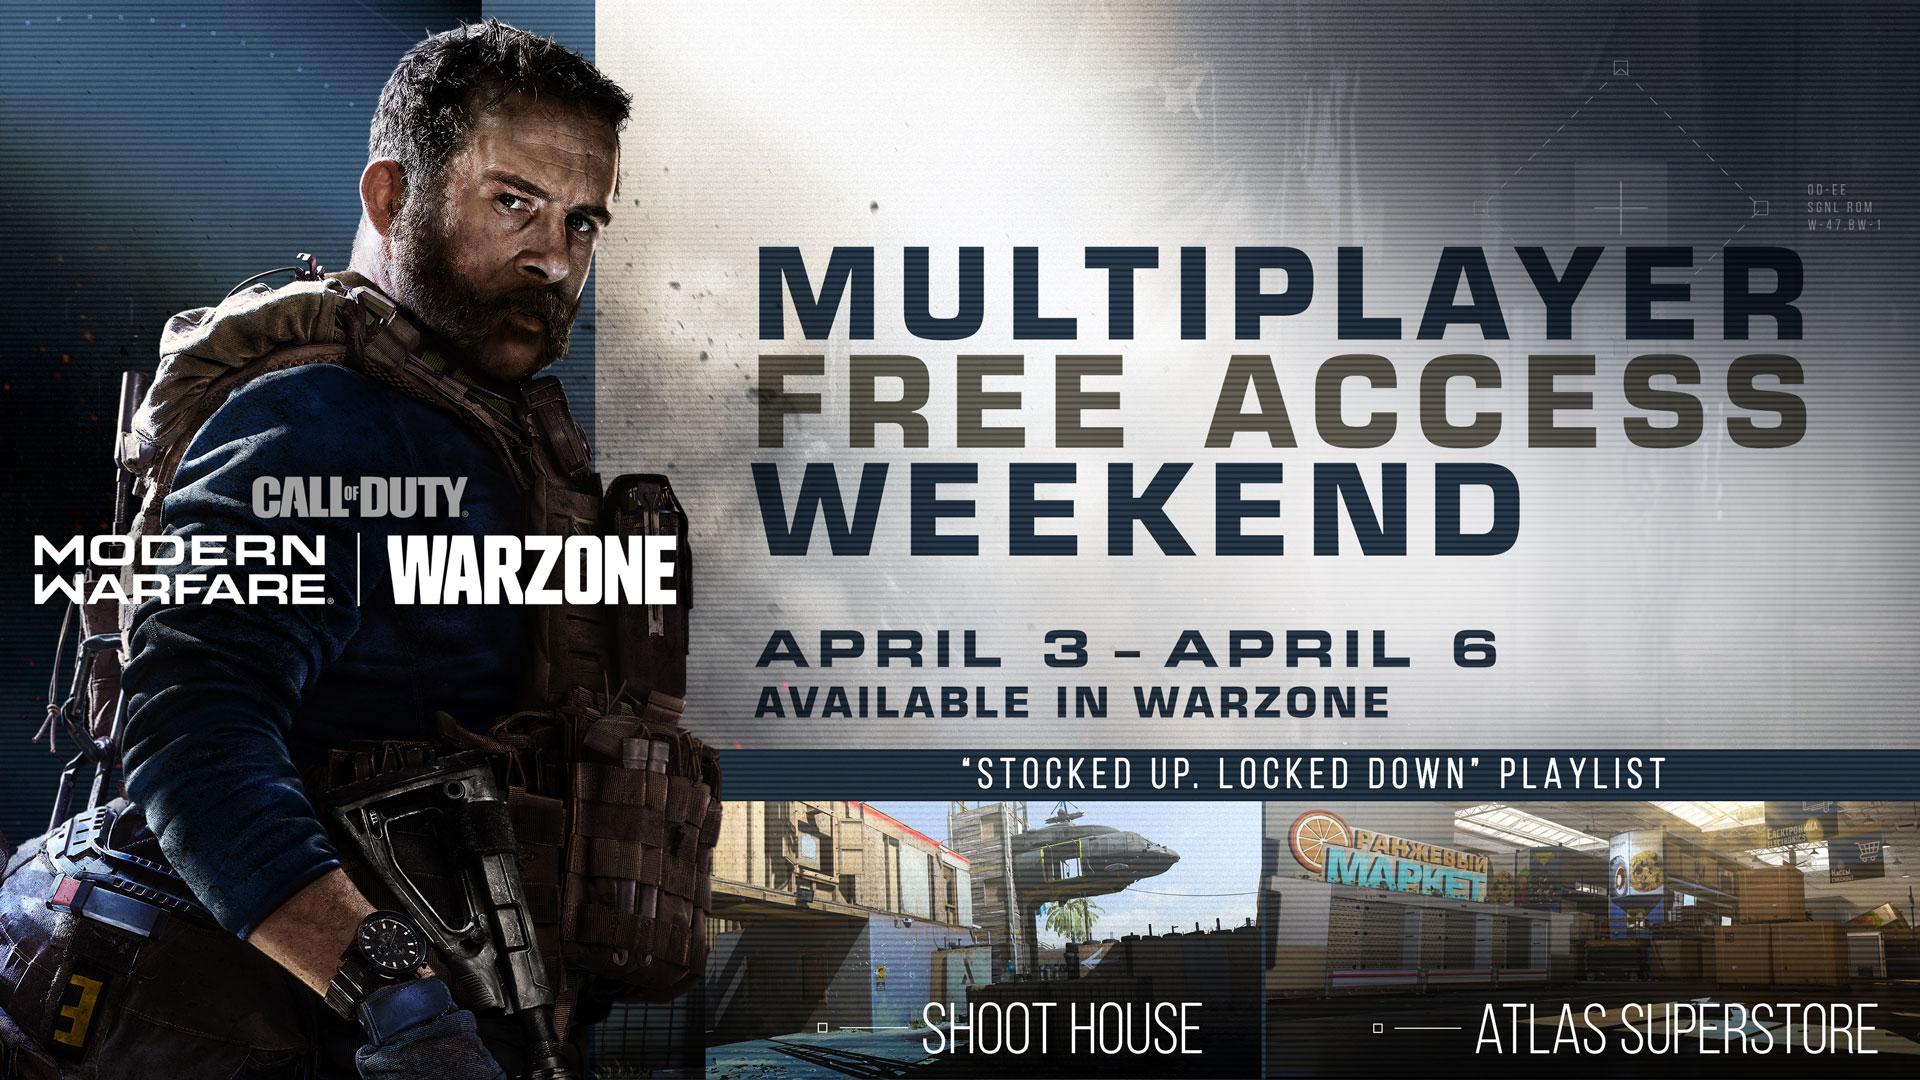 Modern Warfare Multiplayer Free Access Weekend